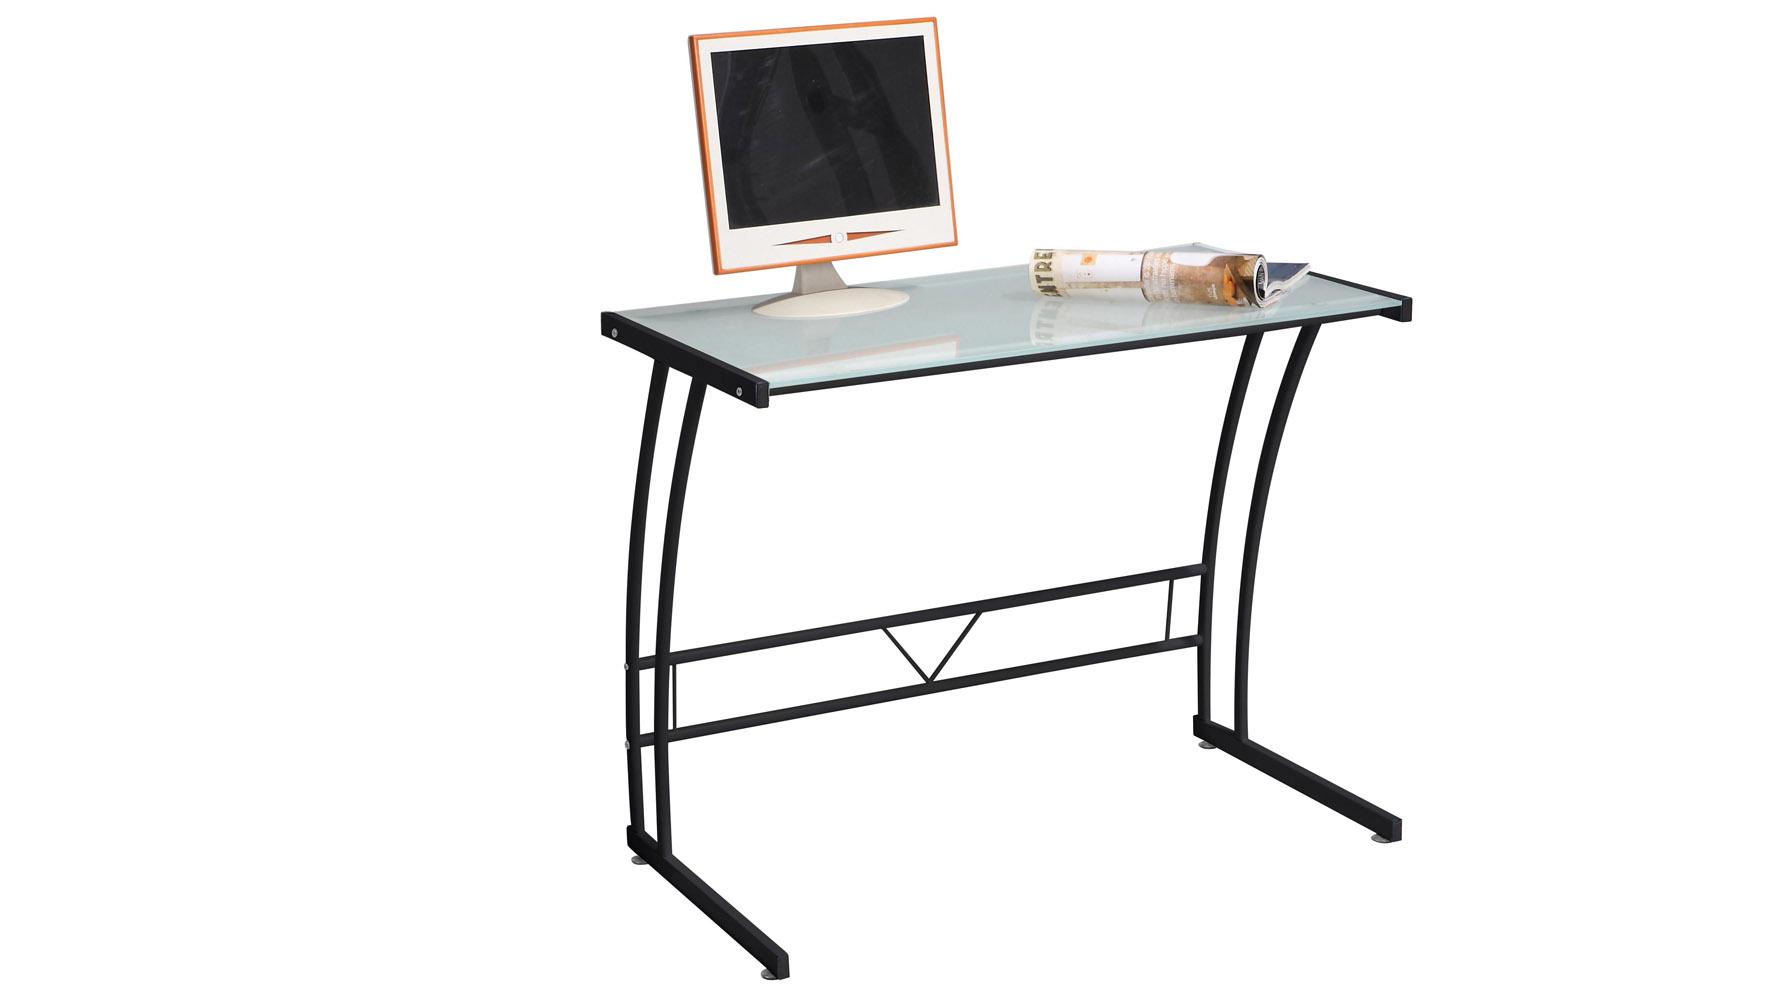 desk chair groupon ikea and ottoman kilby zuri furniture